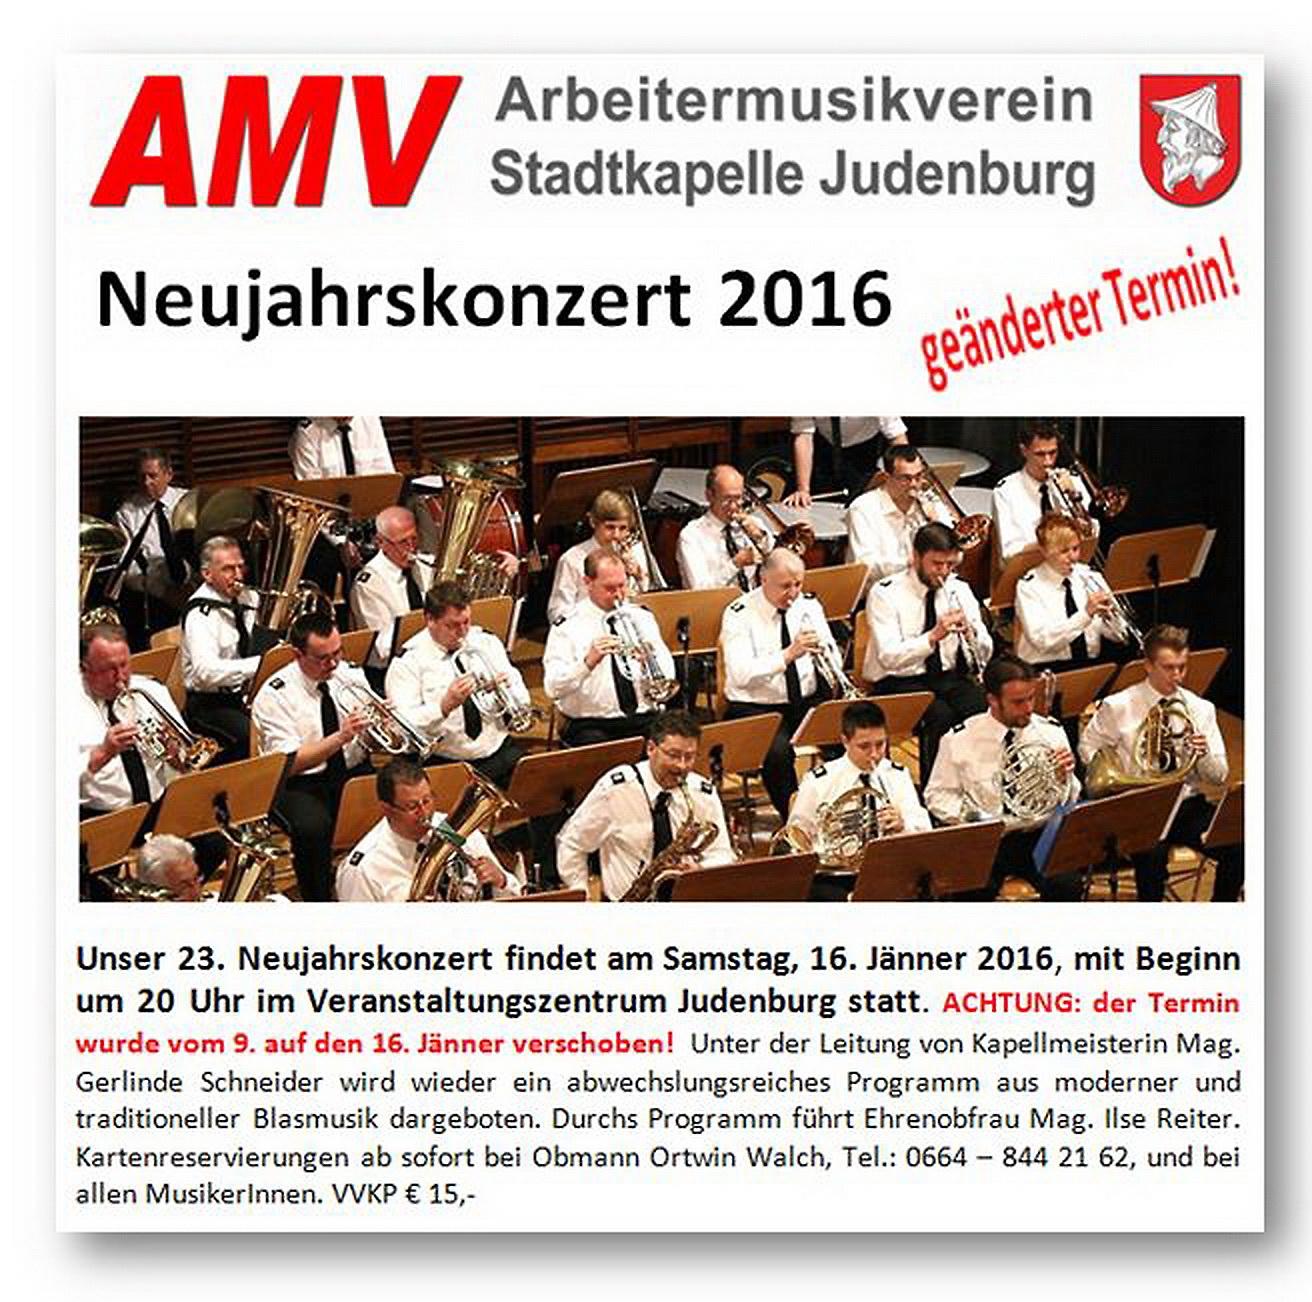 NJ Konzert 2016